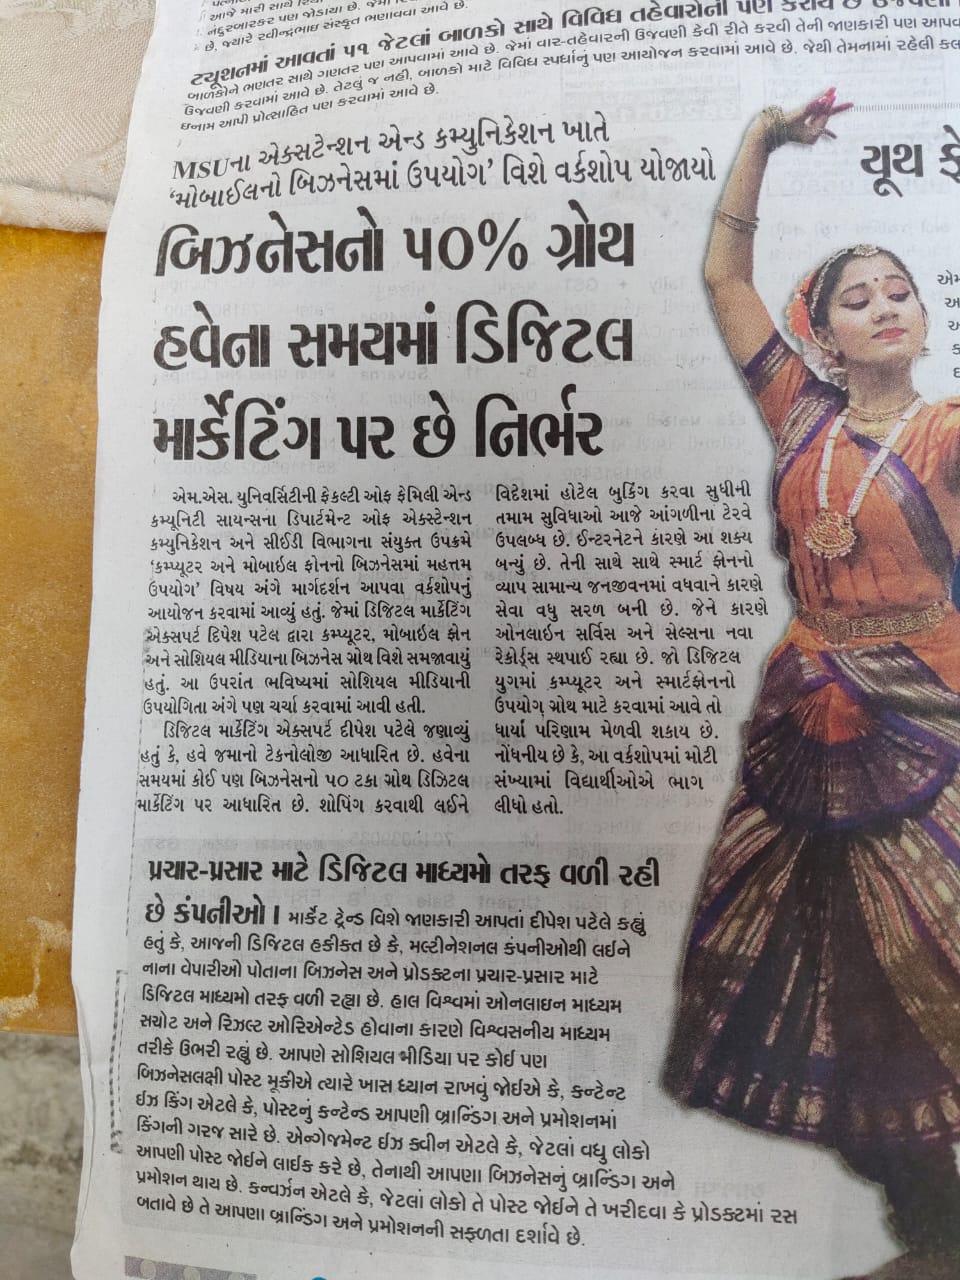 Dipeshpreneur Digital marketing course in Sandesh gujarati news paper